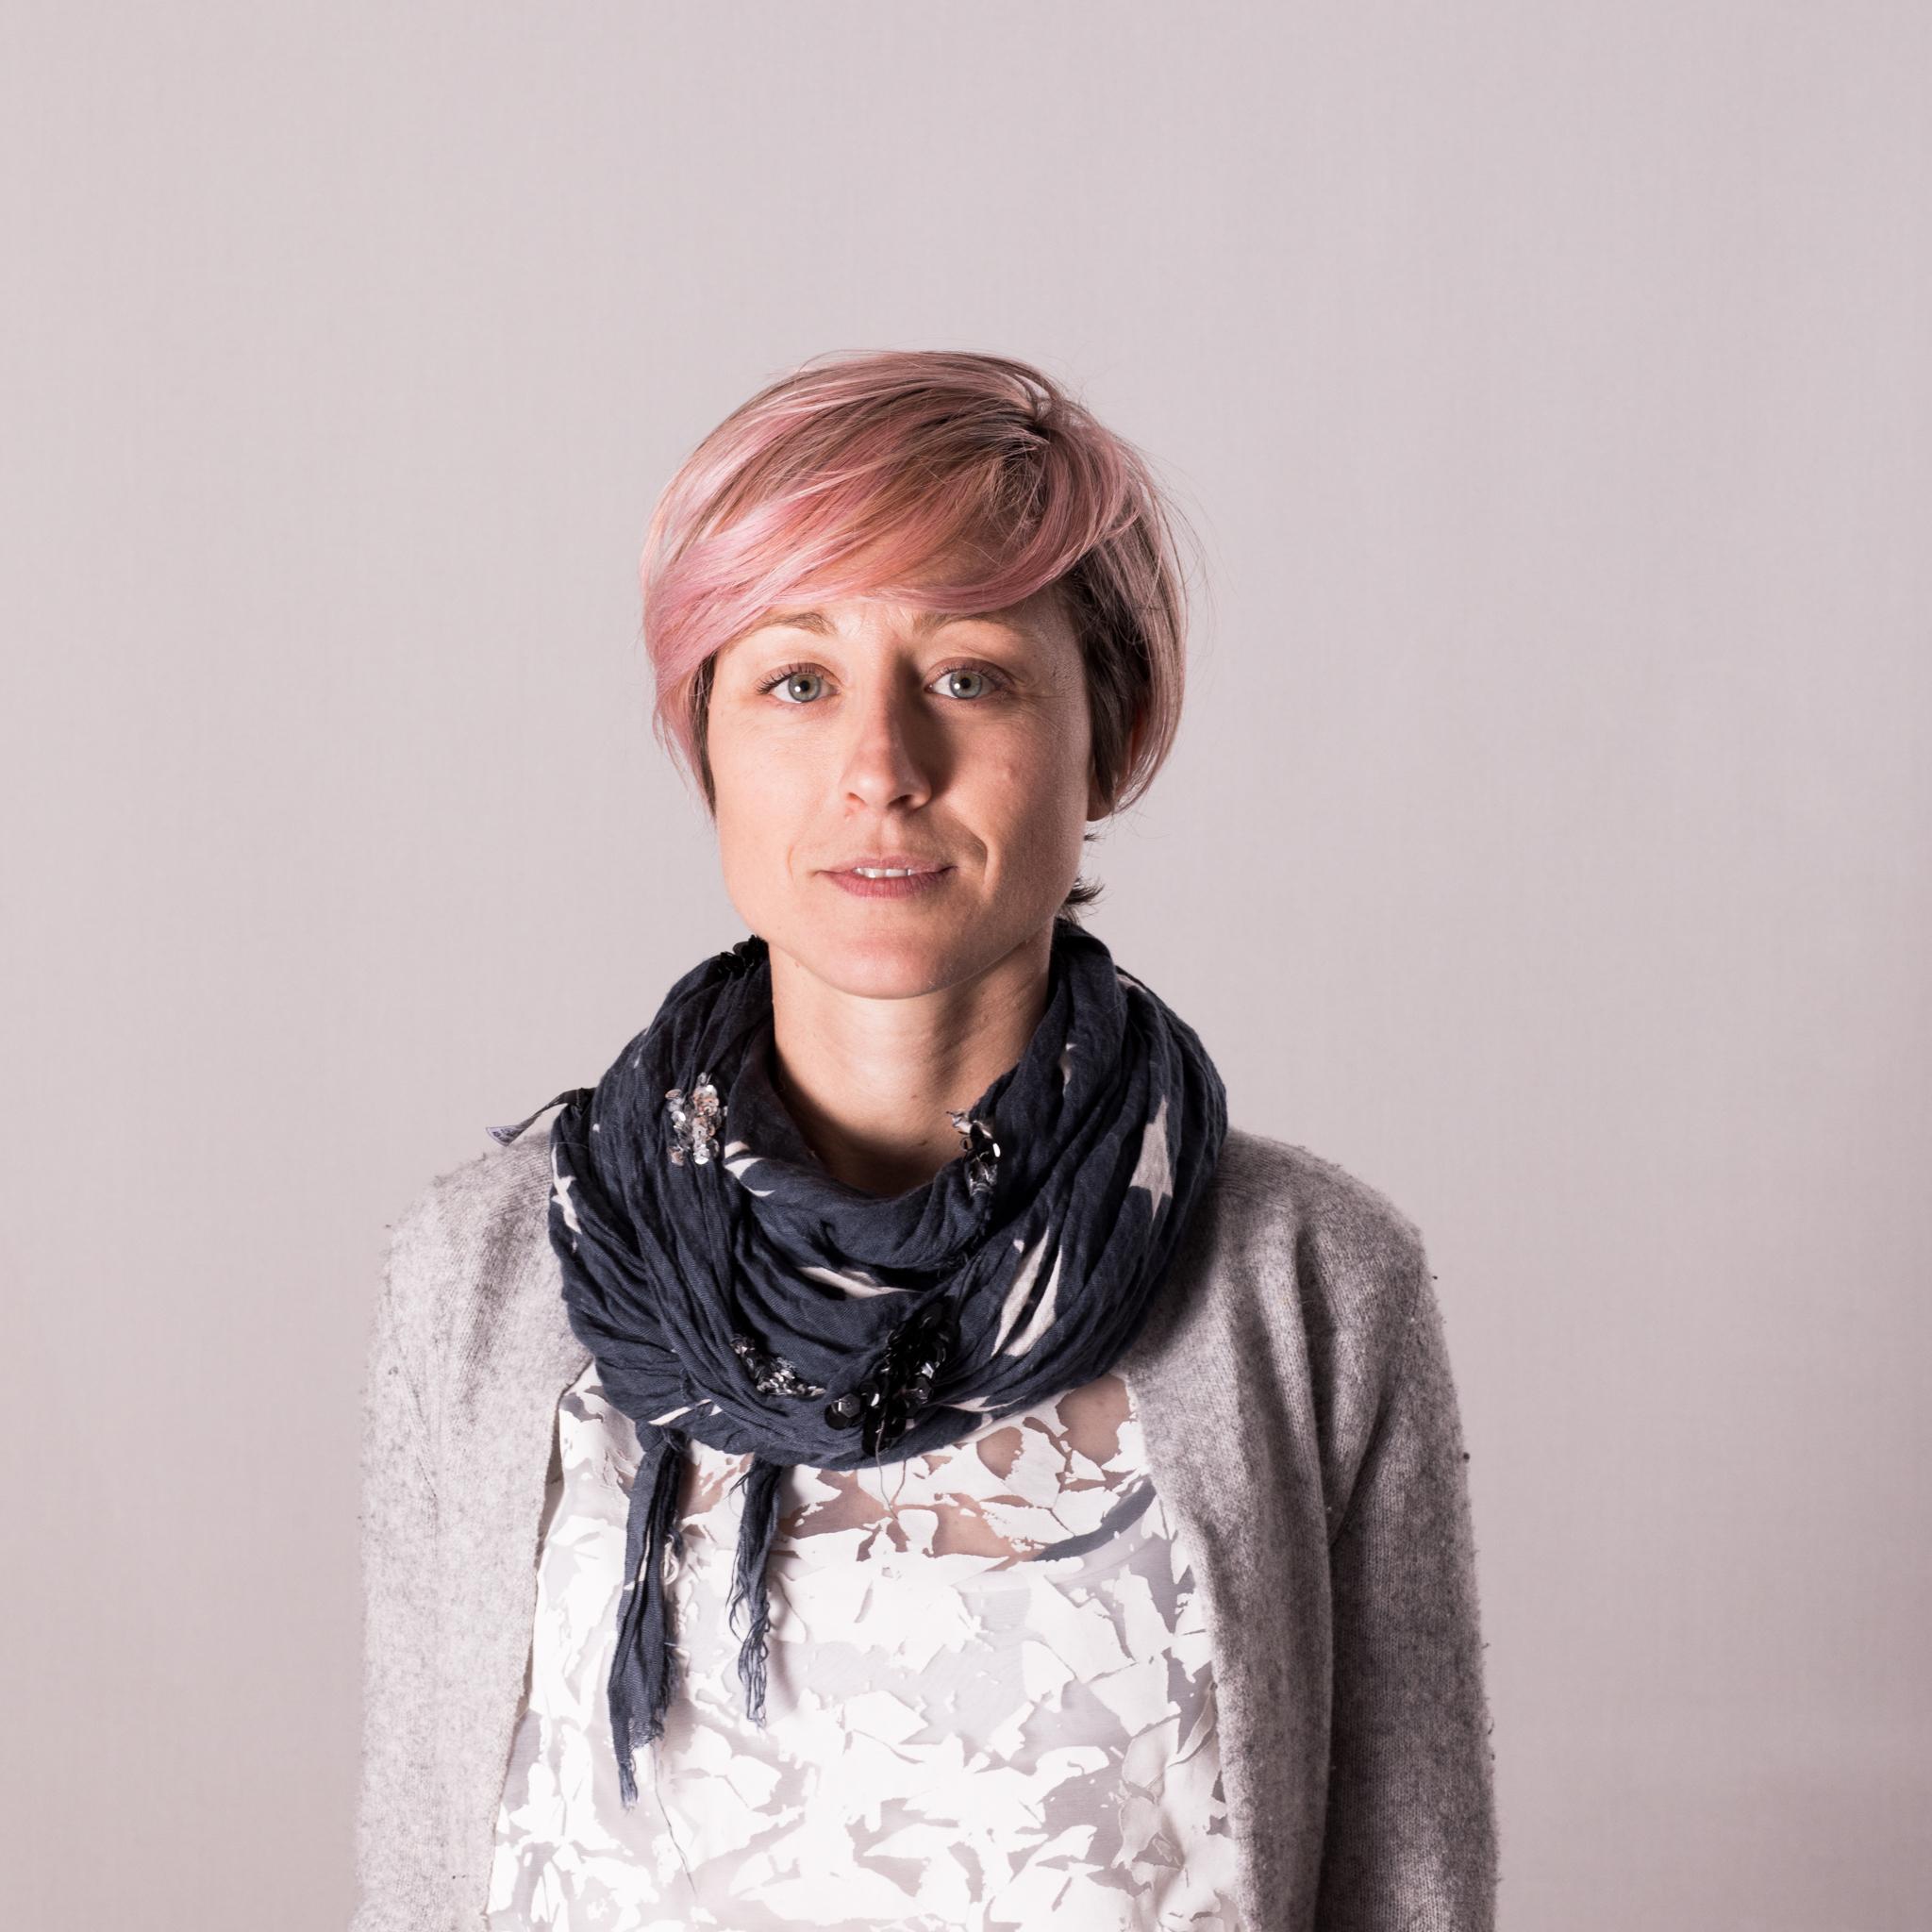 Nicoletta Tranquillo